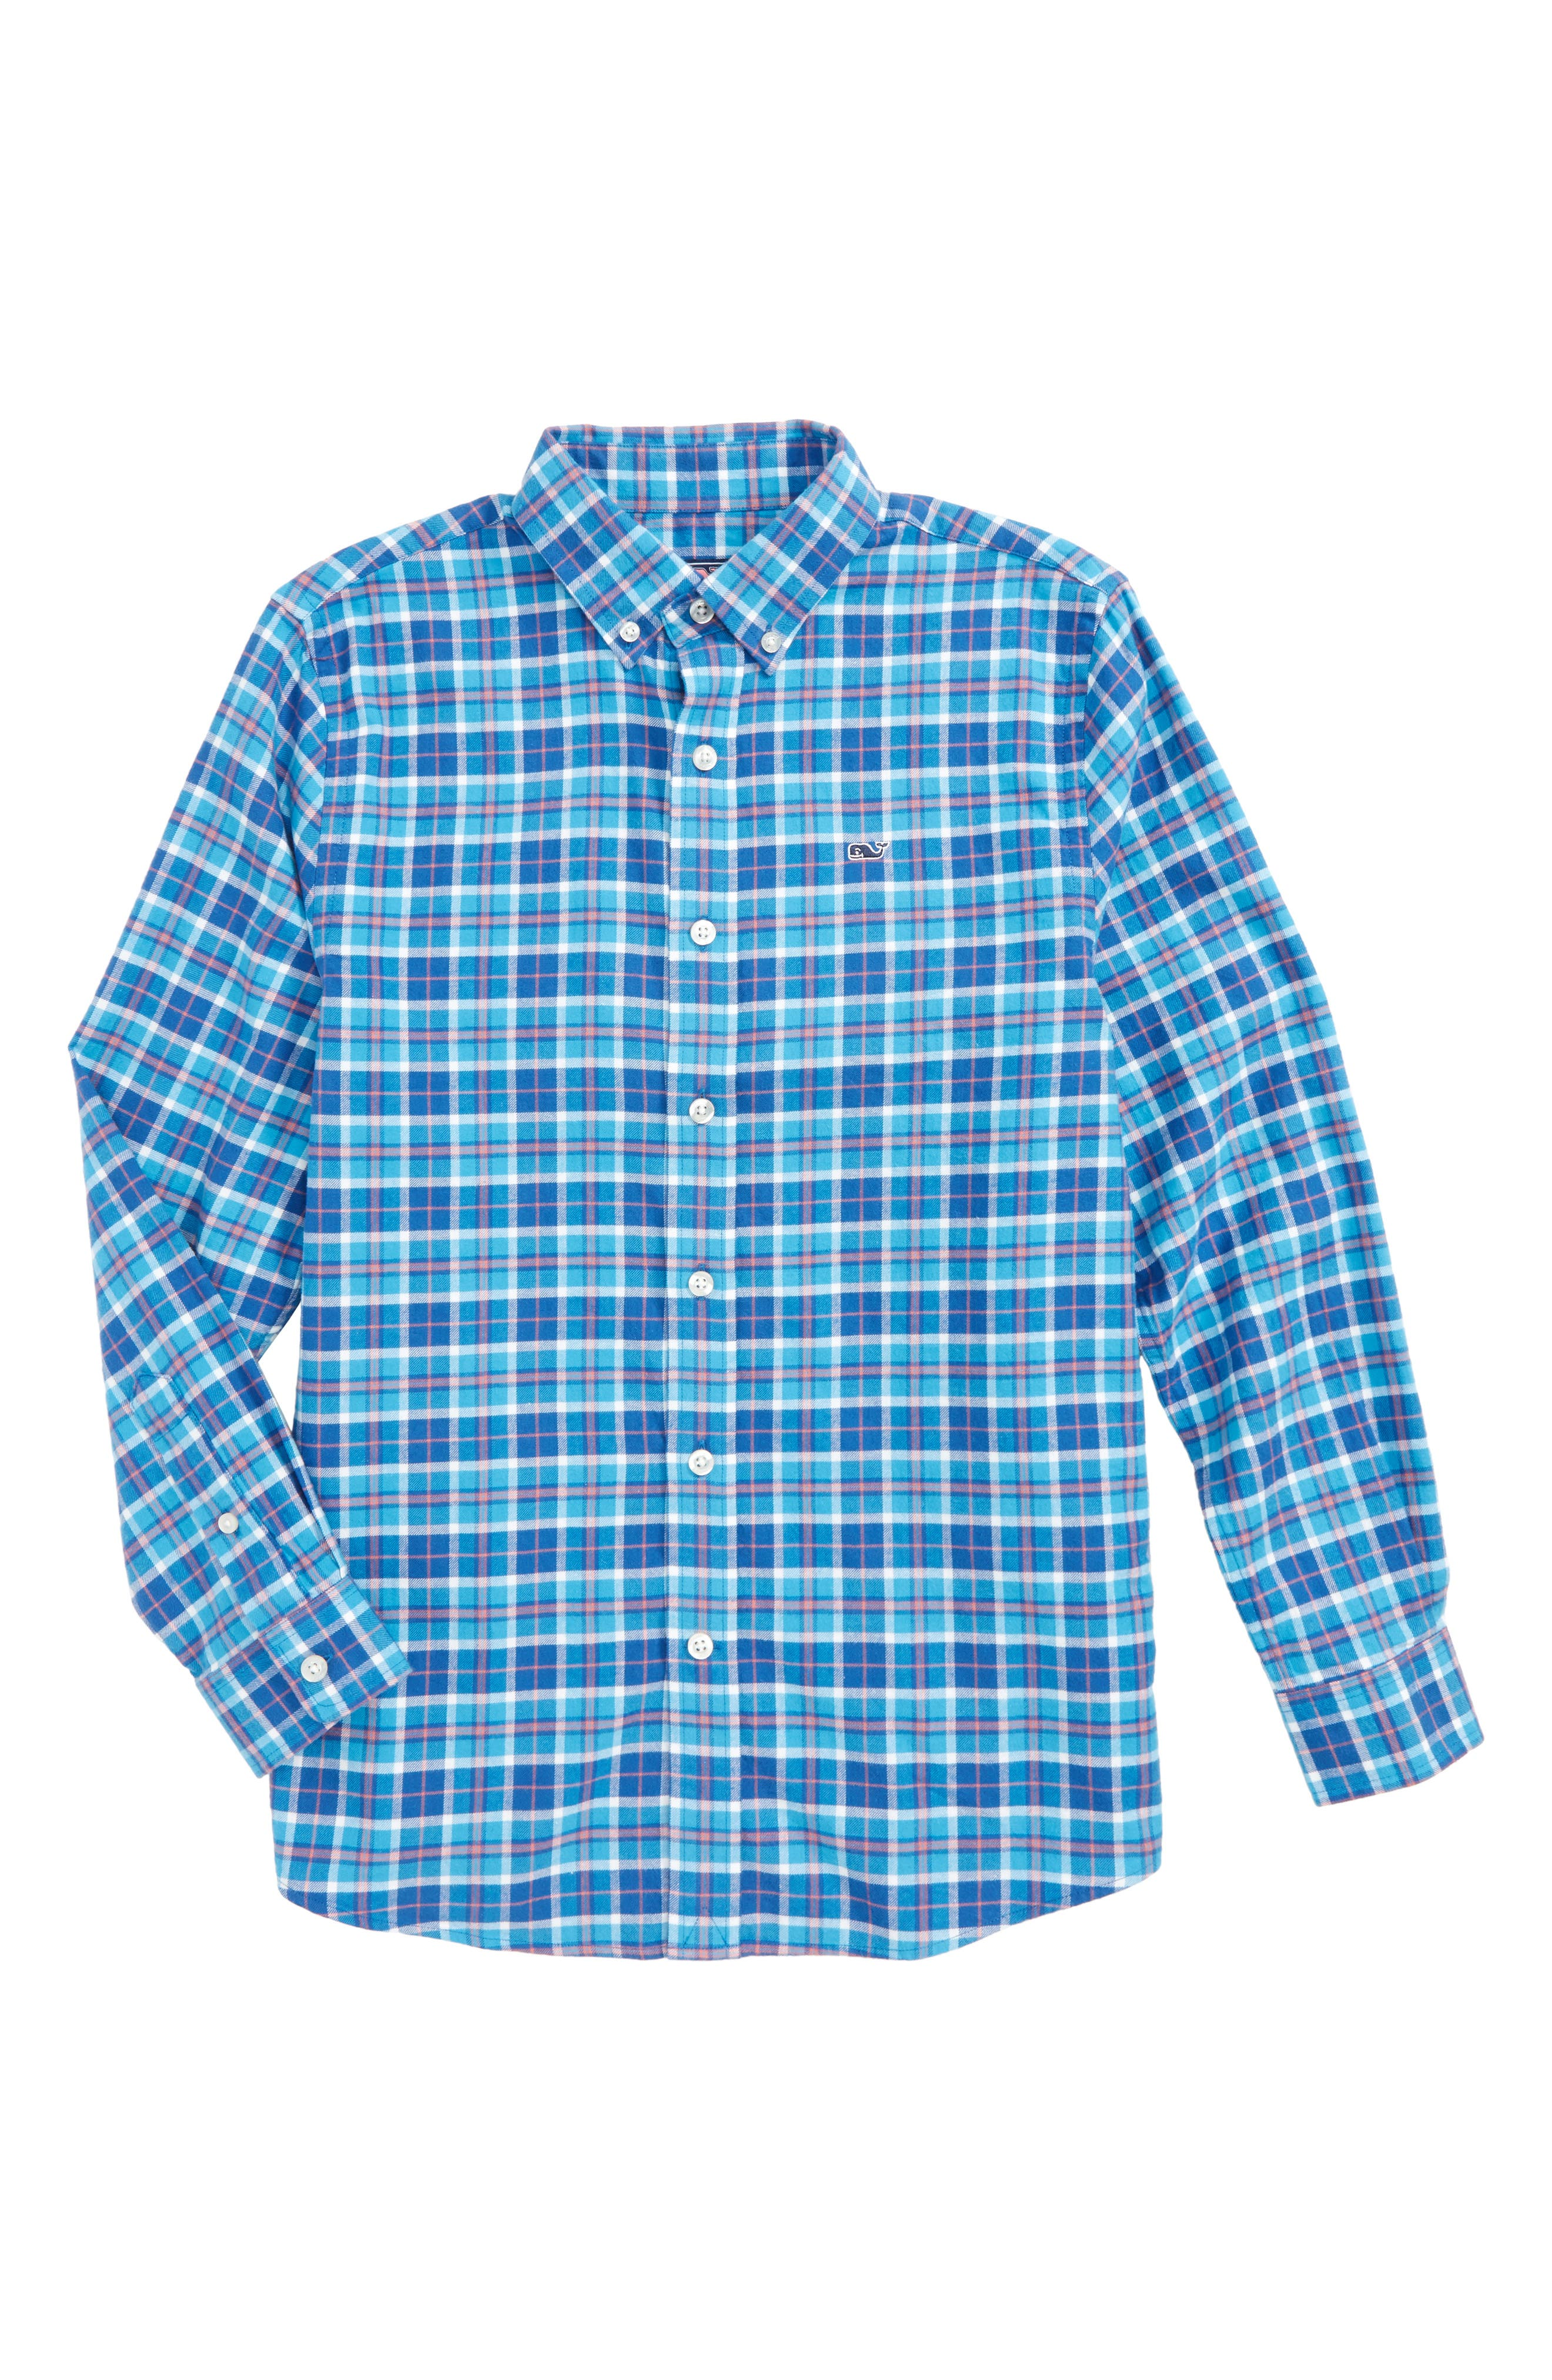 Plaskett Creek Plaid Whale Shirt,                             Main thumbnail 1, color,                             496